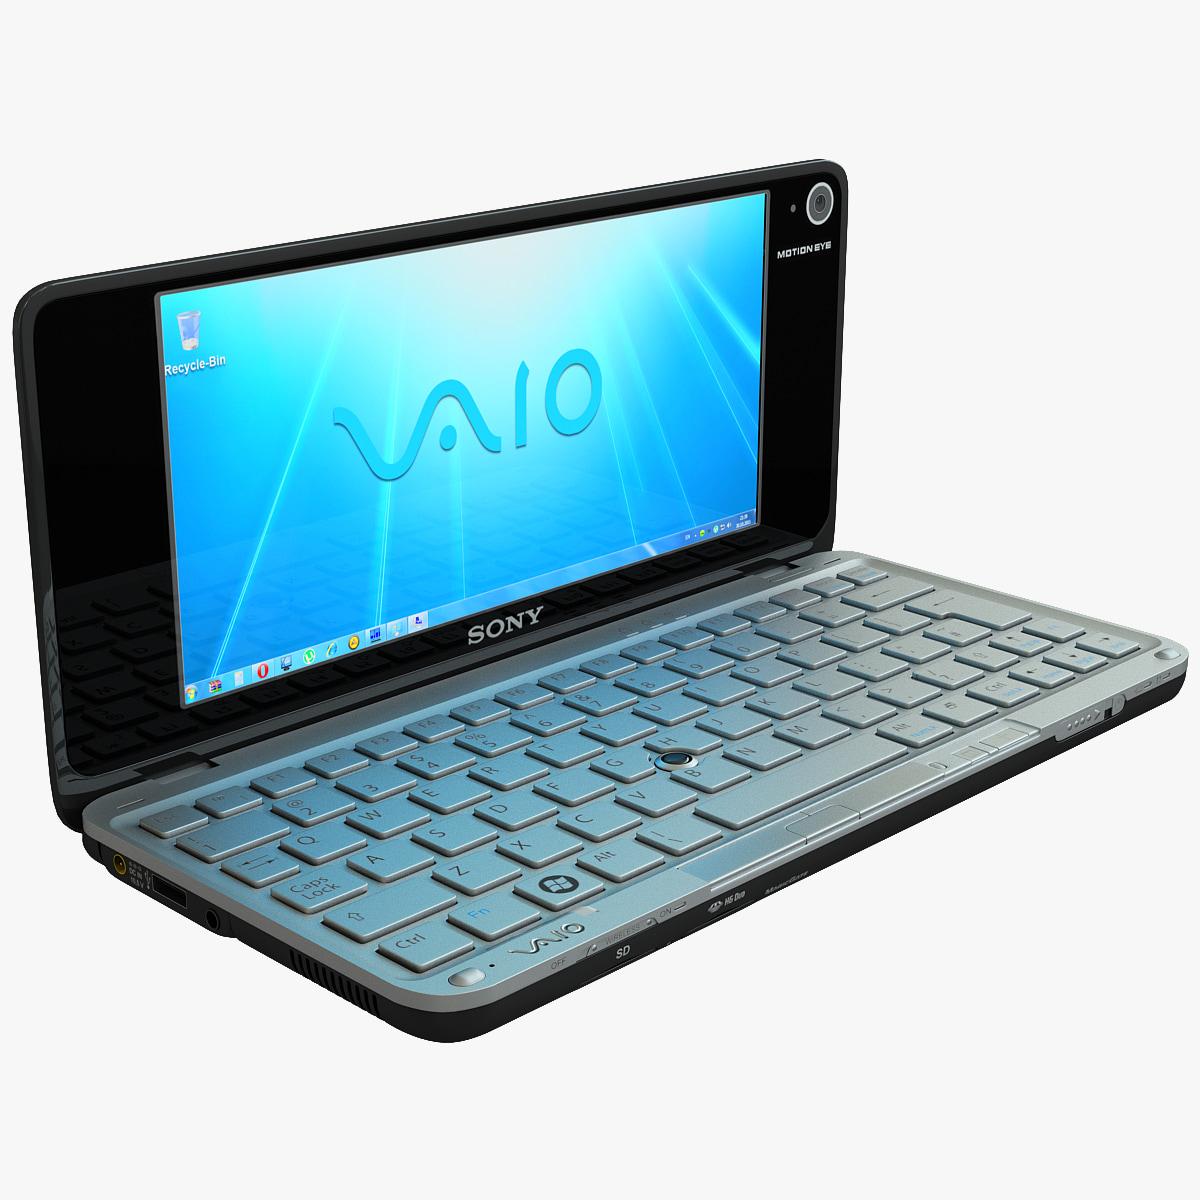 Laptop_Sony_VAIO_P_Black_000.jpg